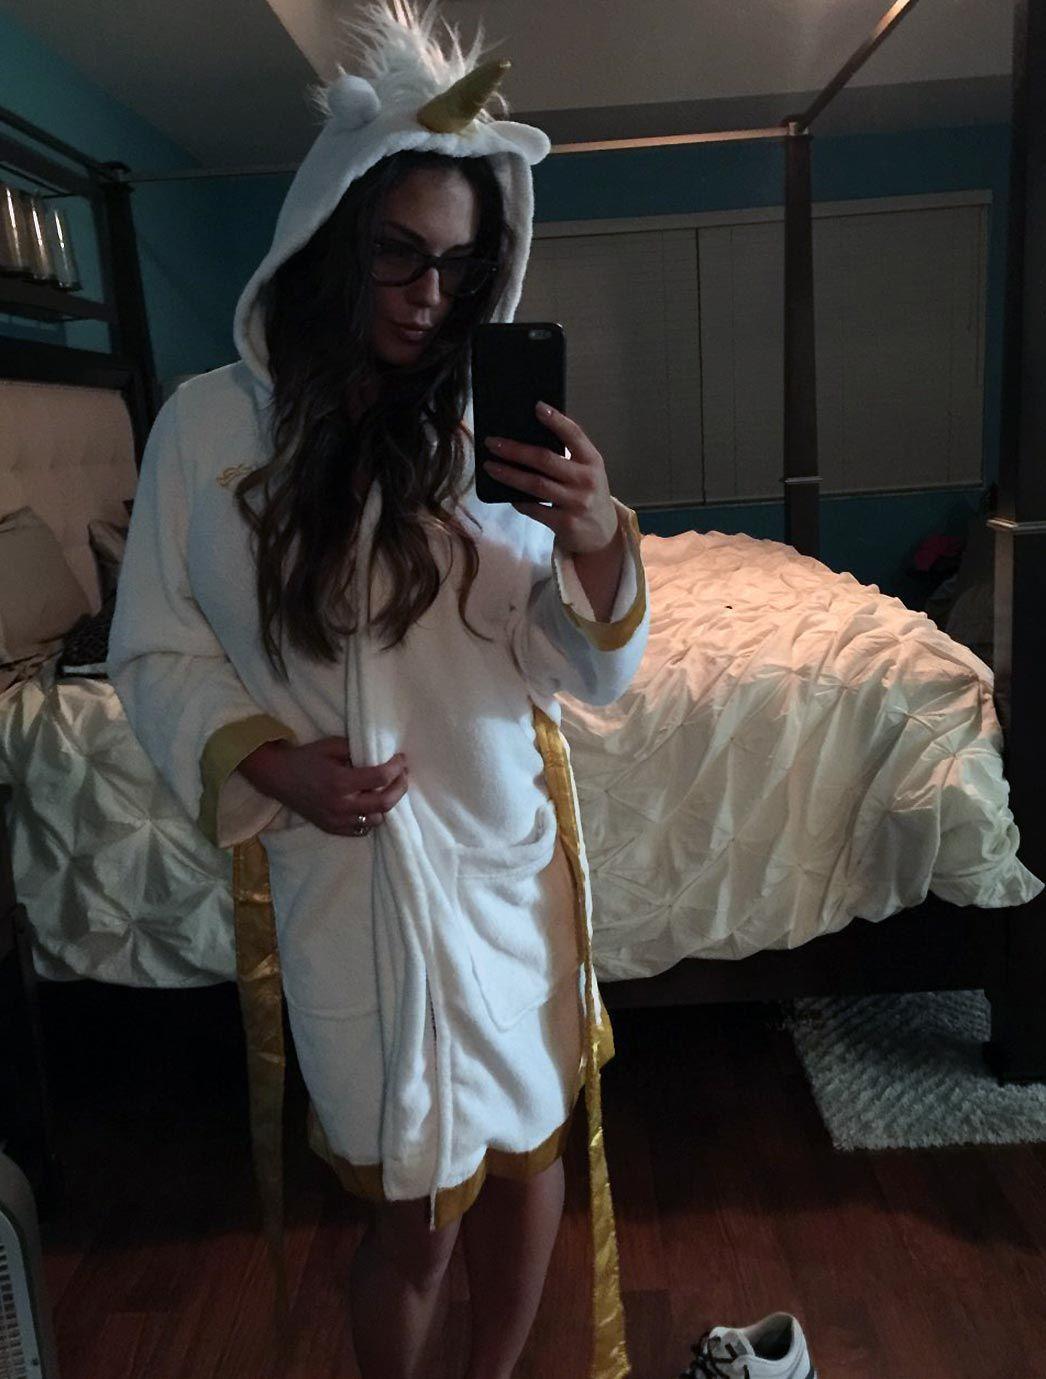 Celeste Bonin Nude Leaked The Fappening & Sexy 0225